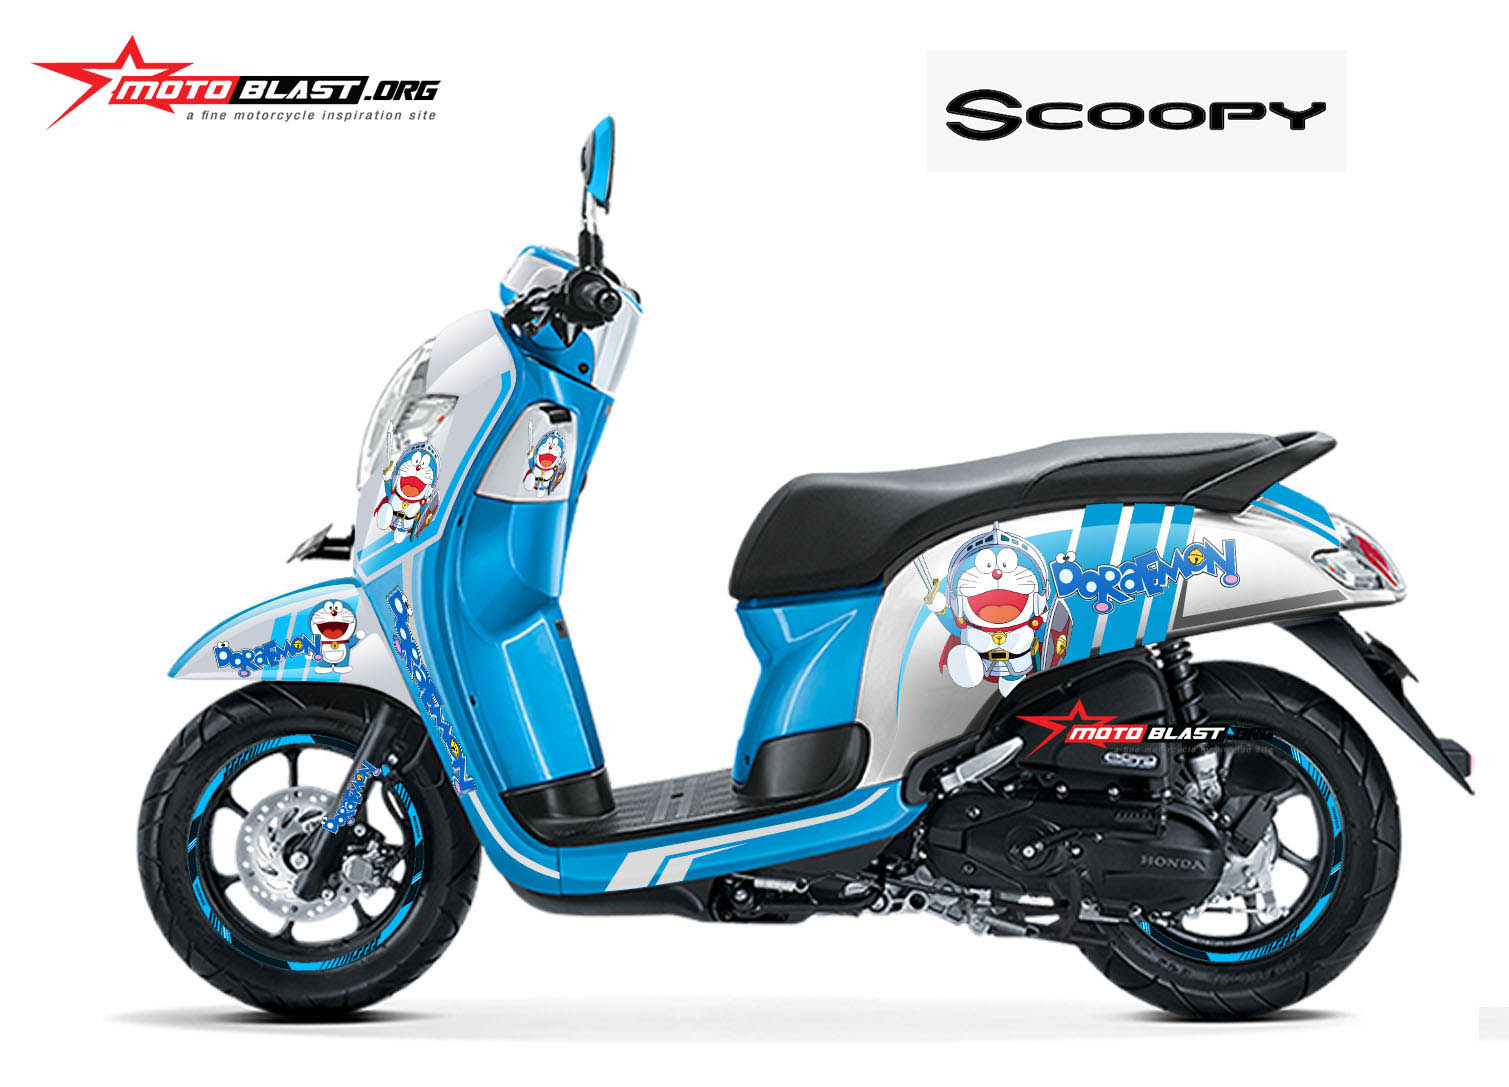 99 Modif Motor Scoopy New Terbaru Kumbara Modif